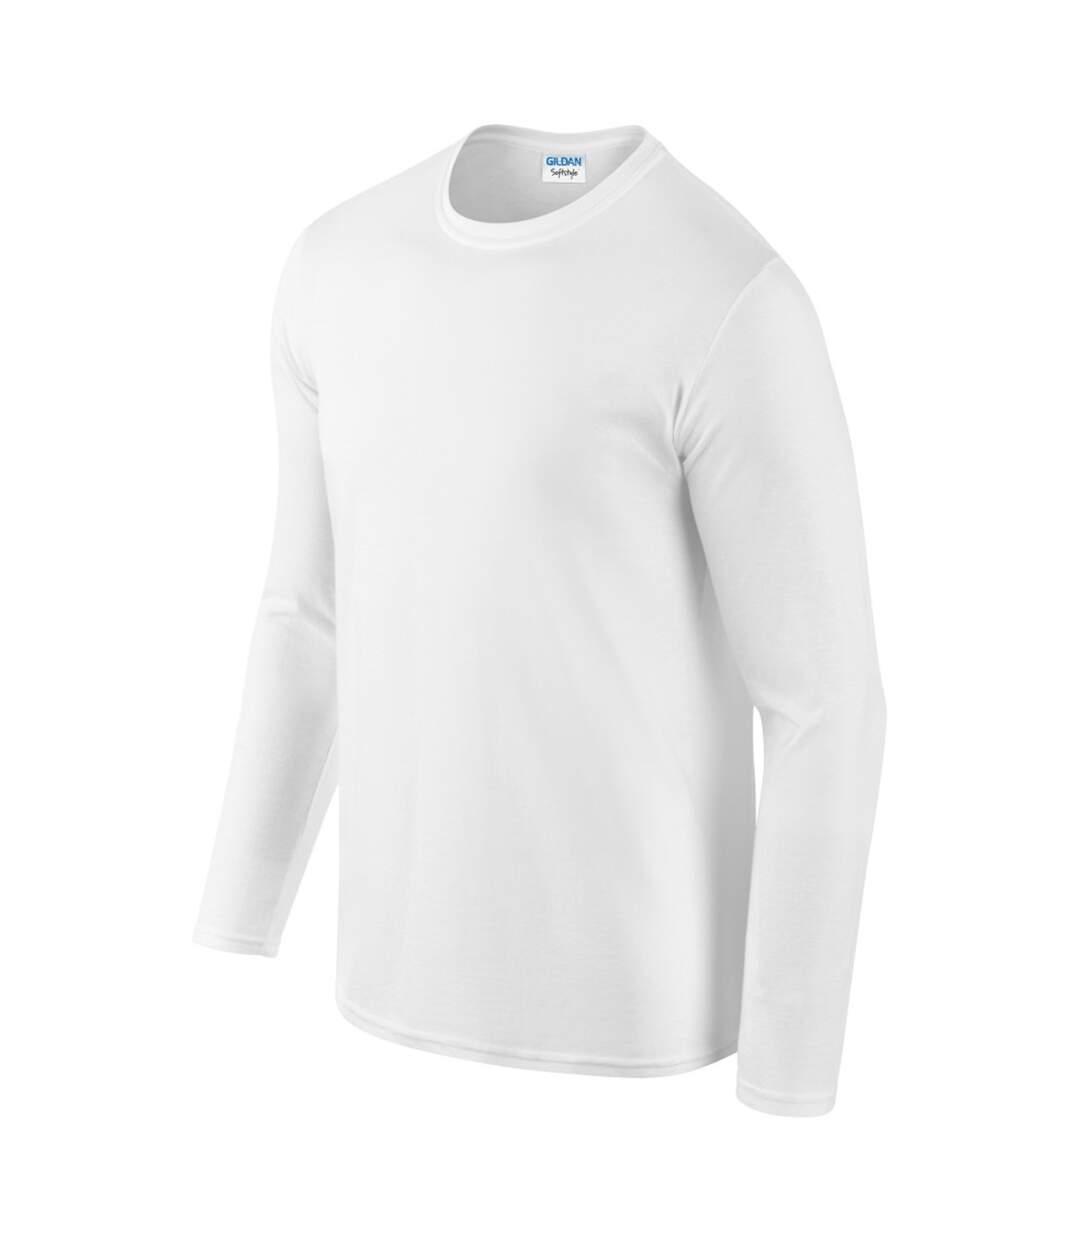 Gildan Mens Soft Style Long Sleeve T-Shirt (White) - UTBC488